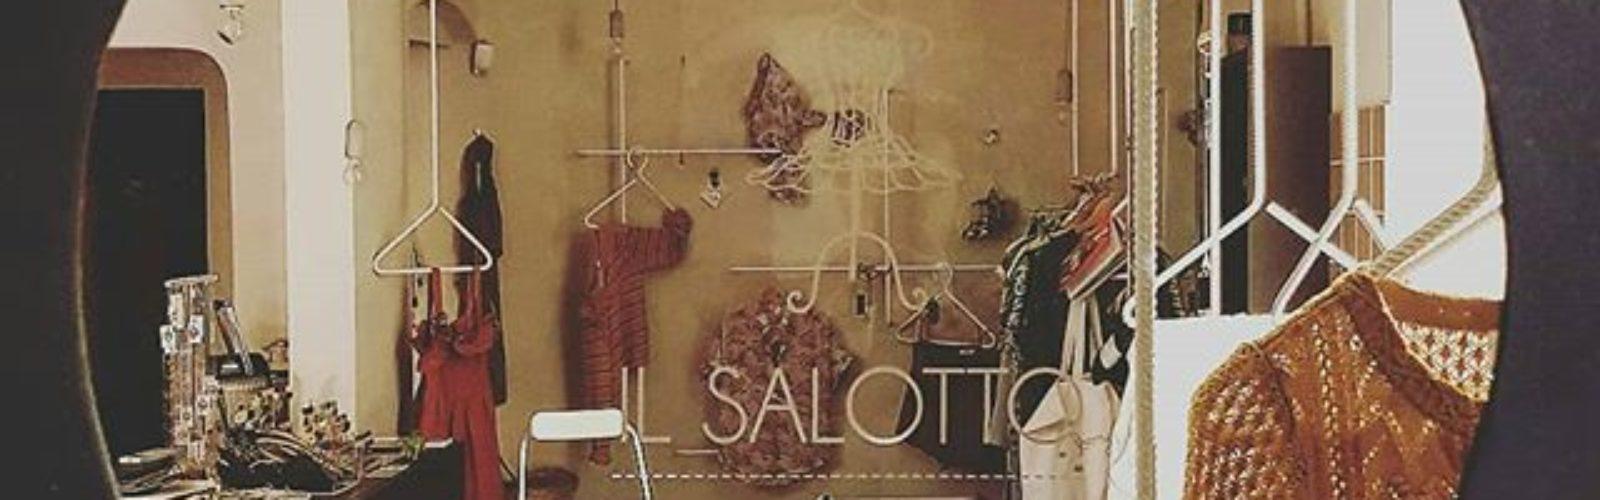 Shop in Genoa By @gosplanarchitects #genova #genoa...